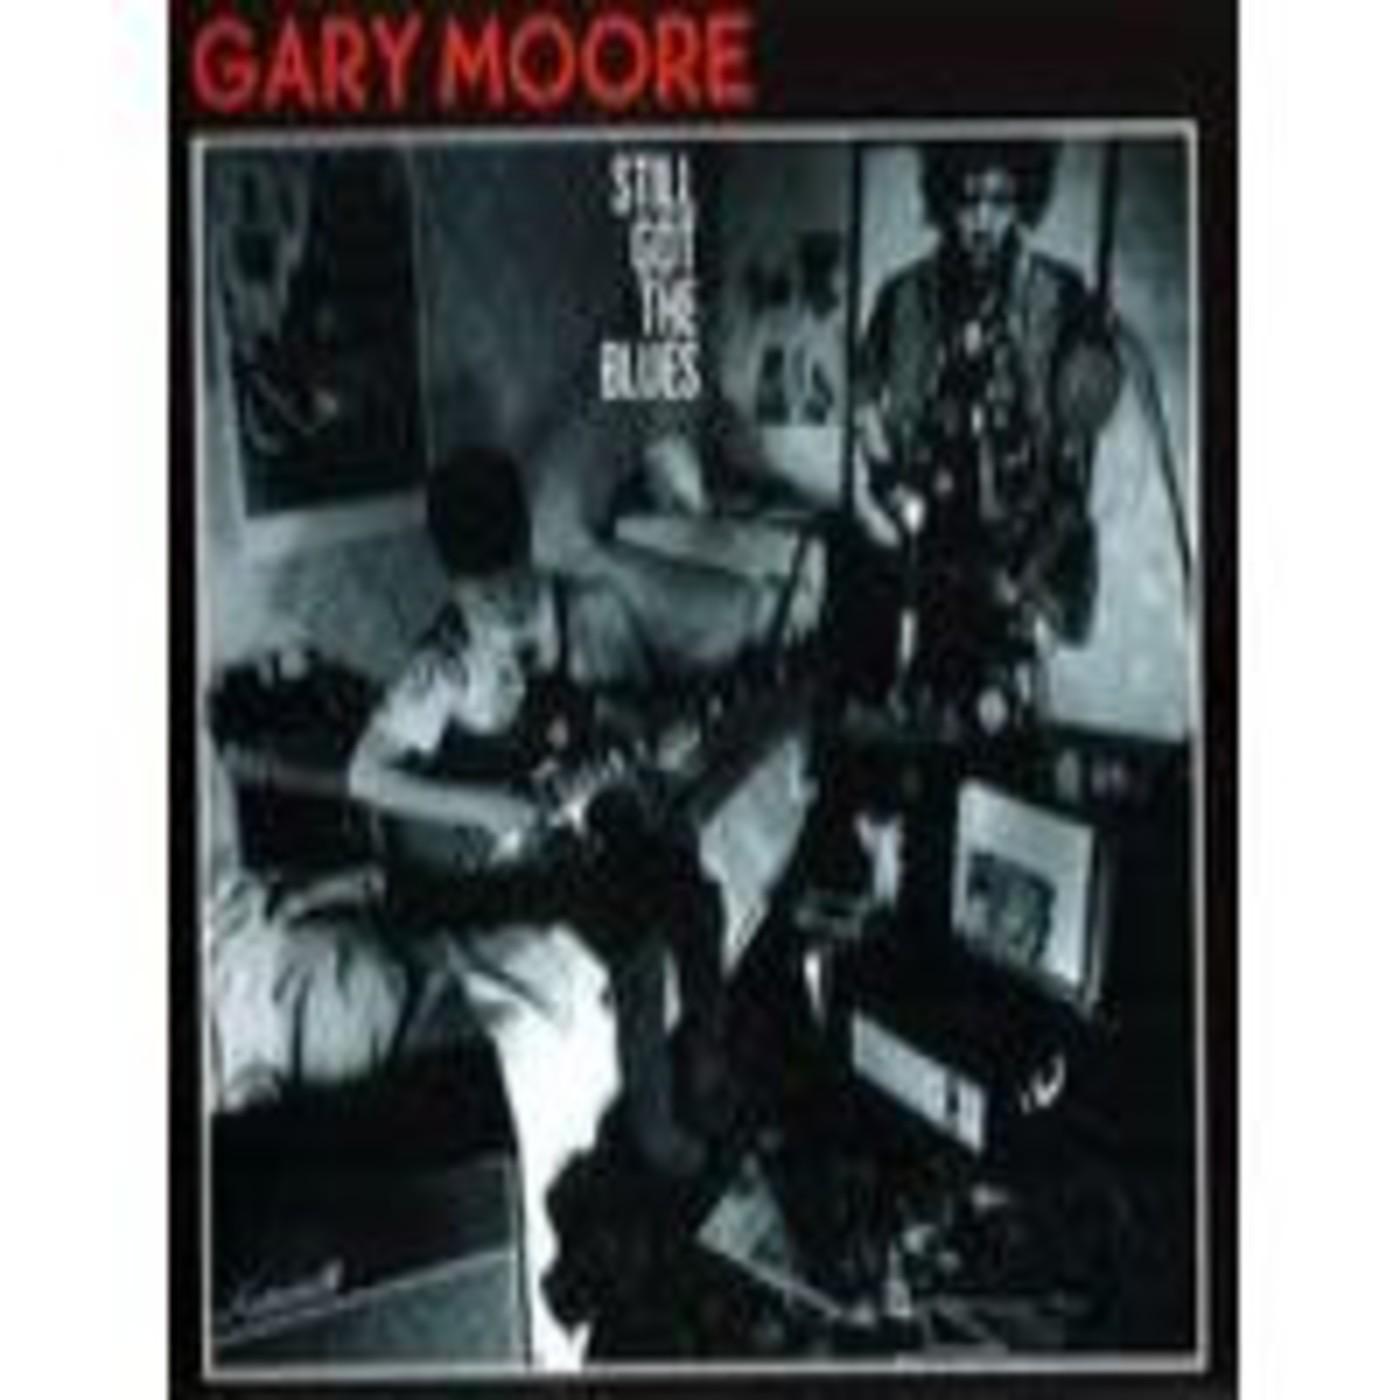 Gary Moore - Still Got The Blues (1990)